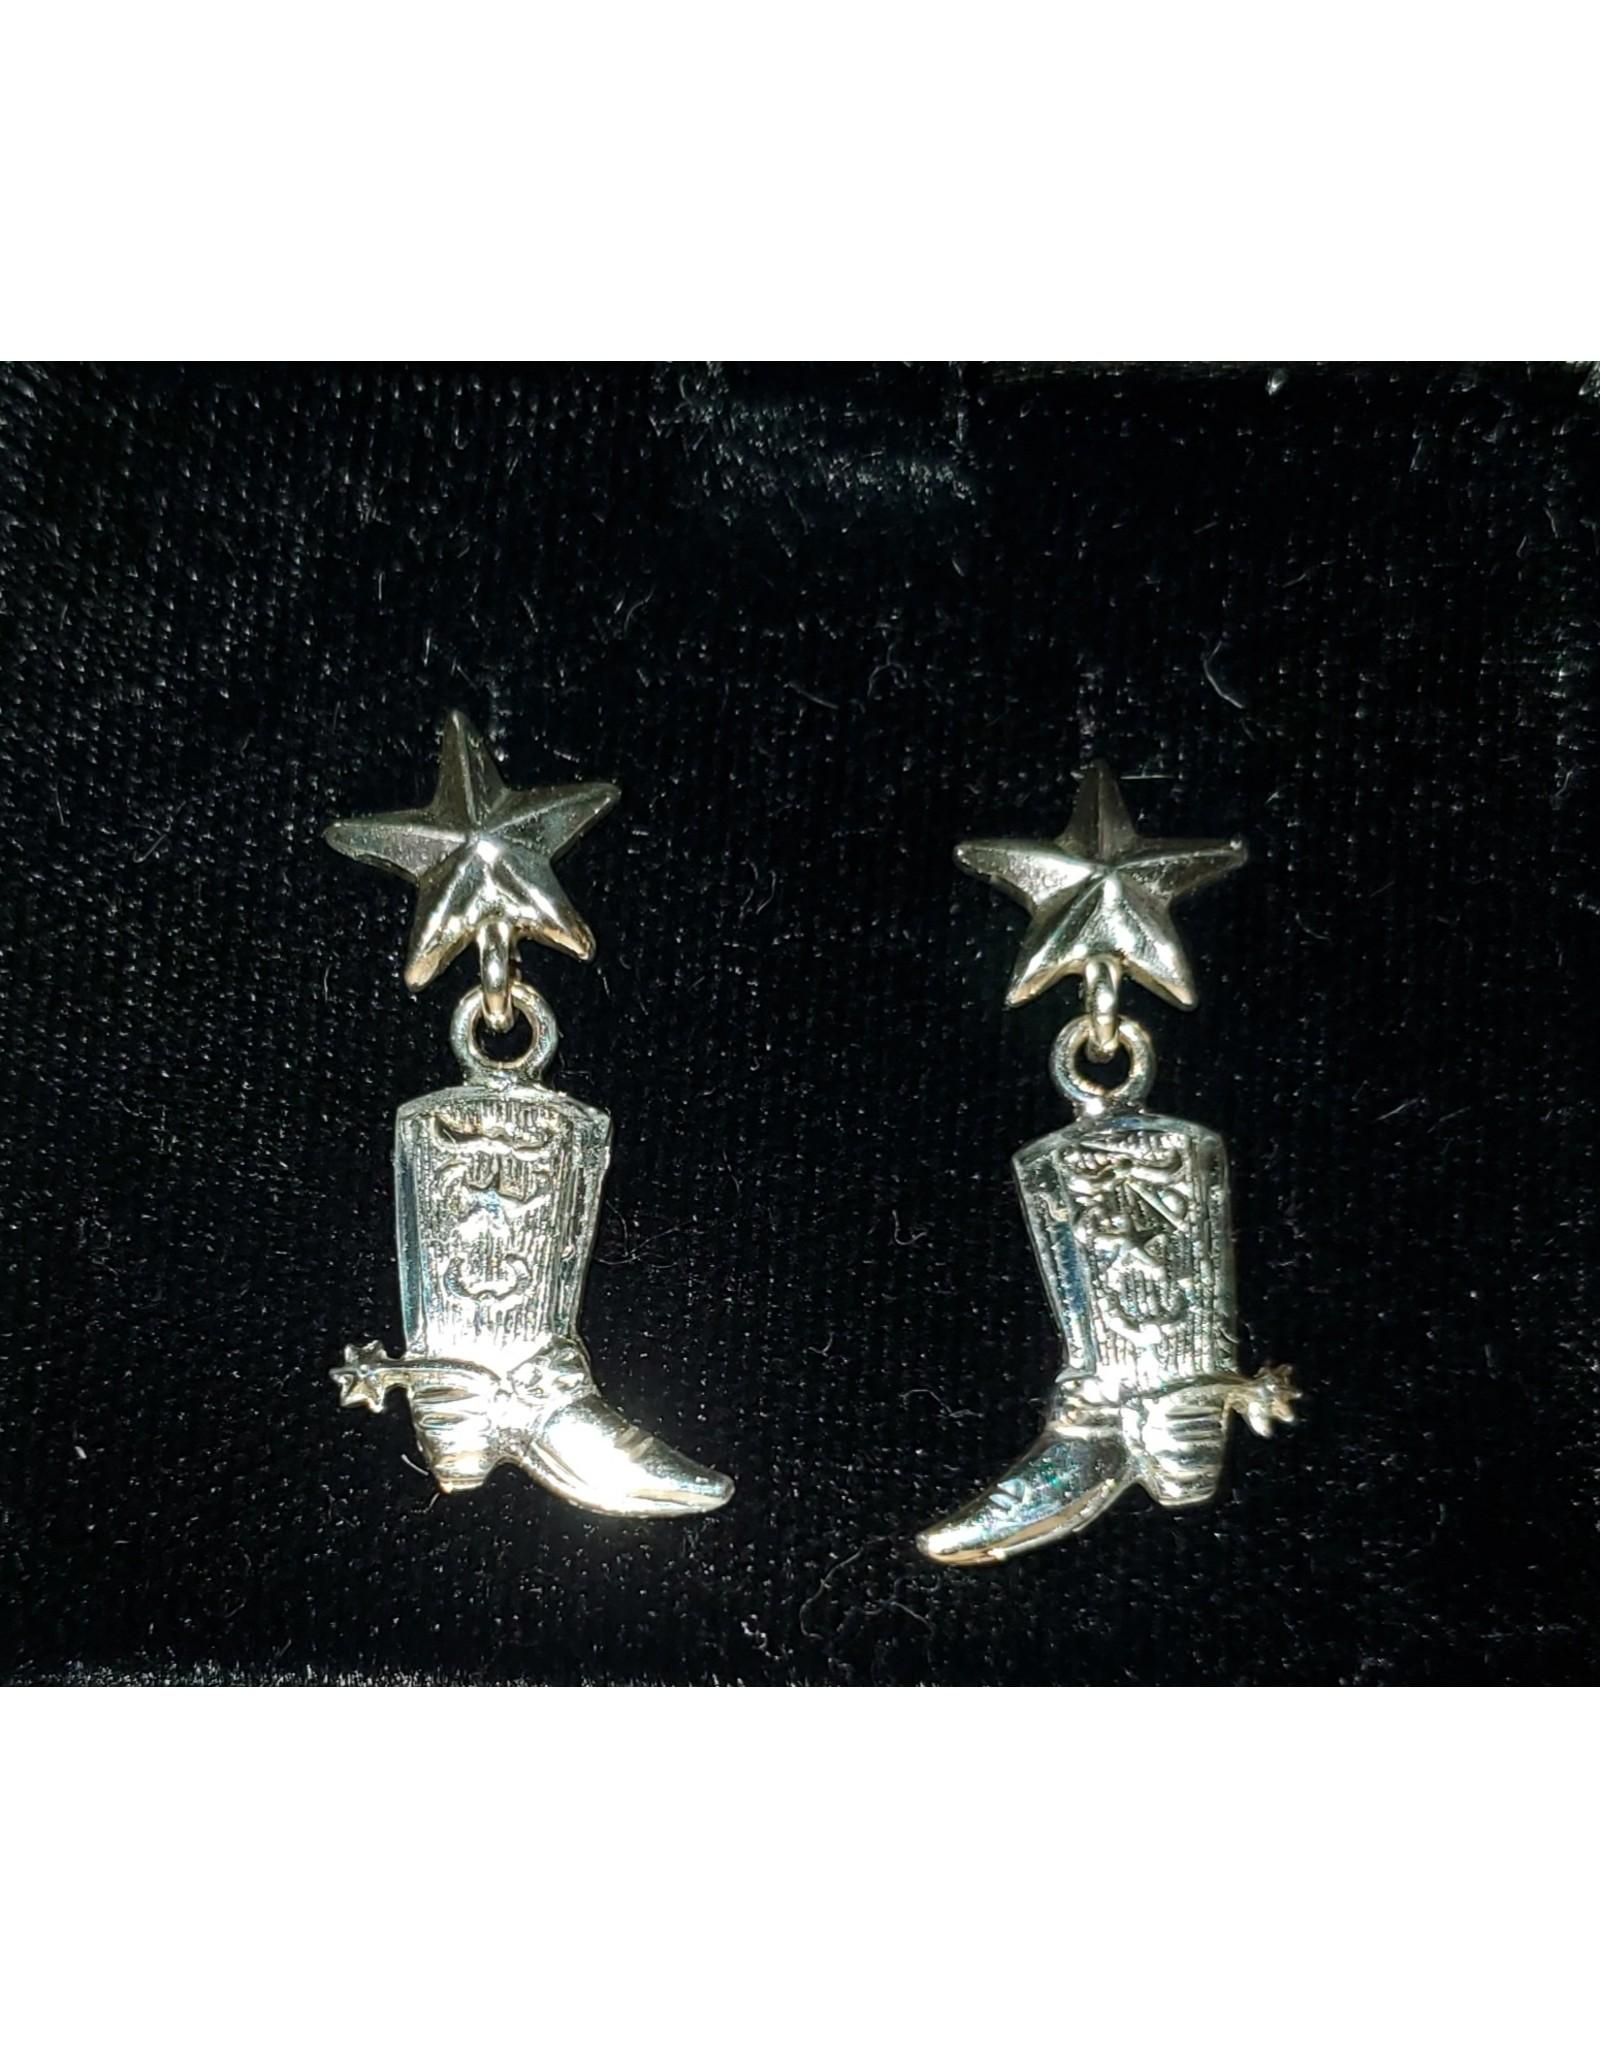 The Miss Dollys Post Earrings